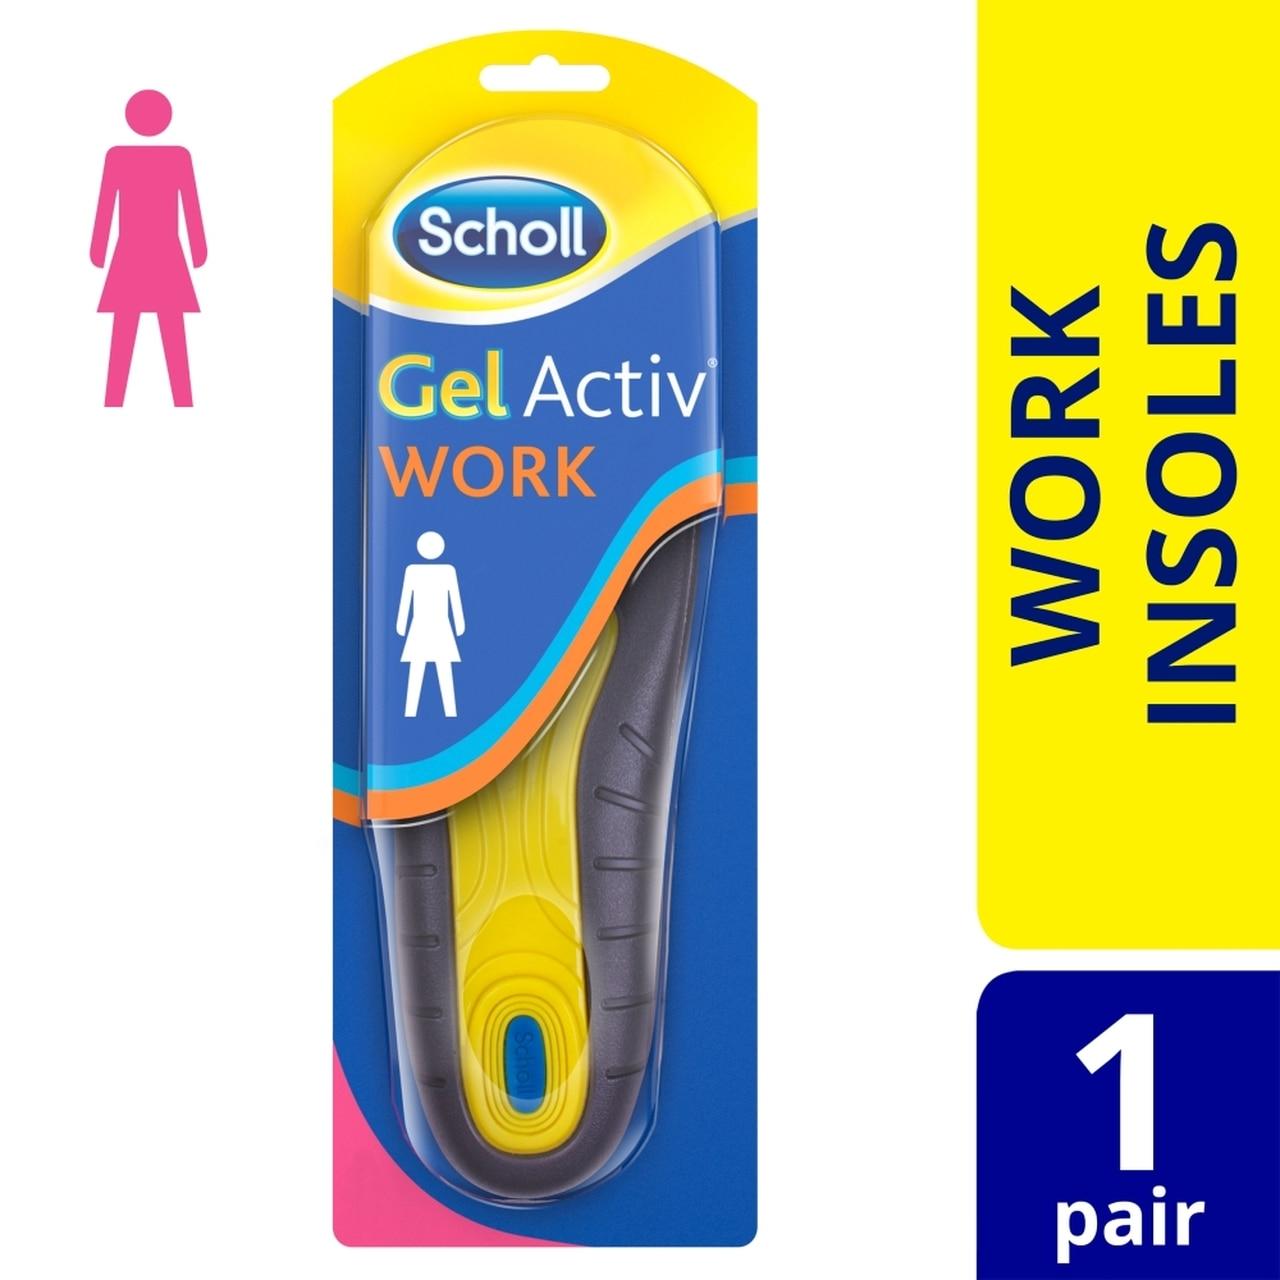 SCHOLL GELACTIV WORK FOR WOMEN